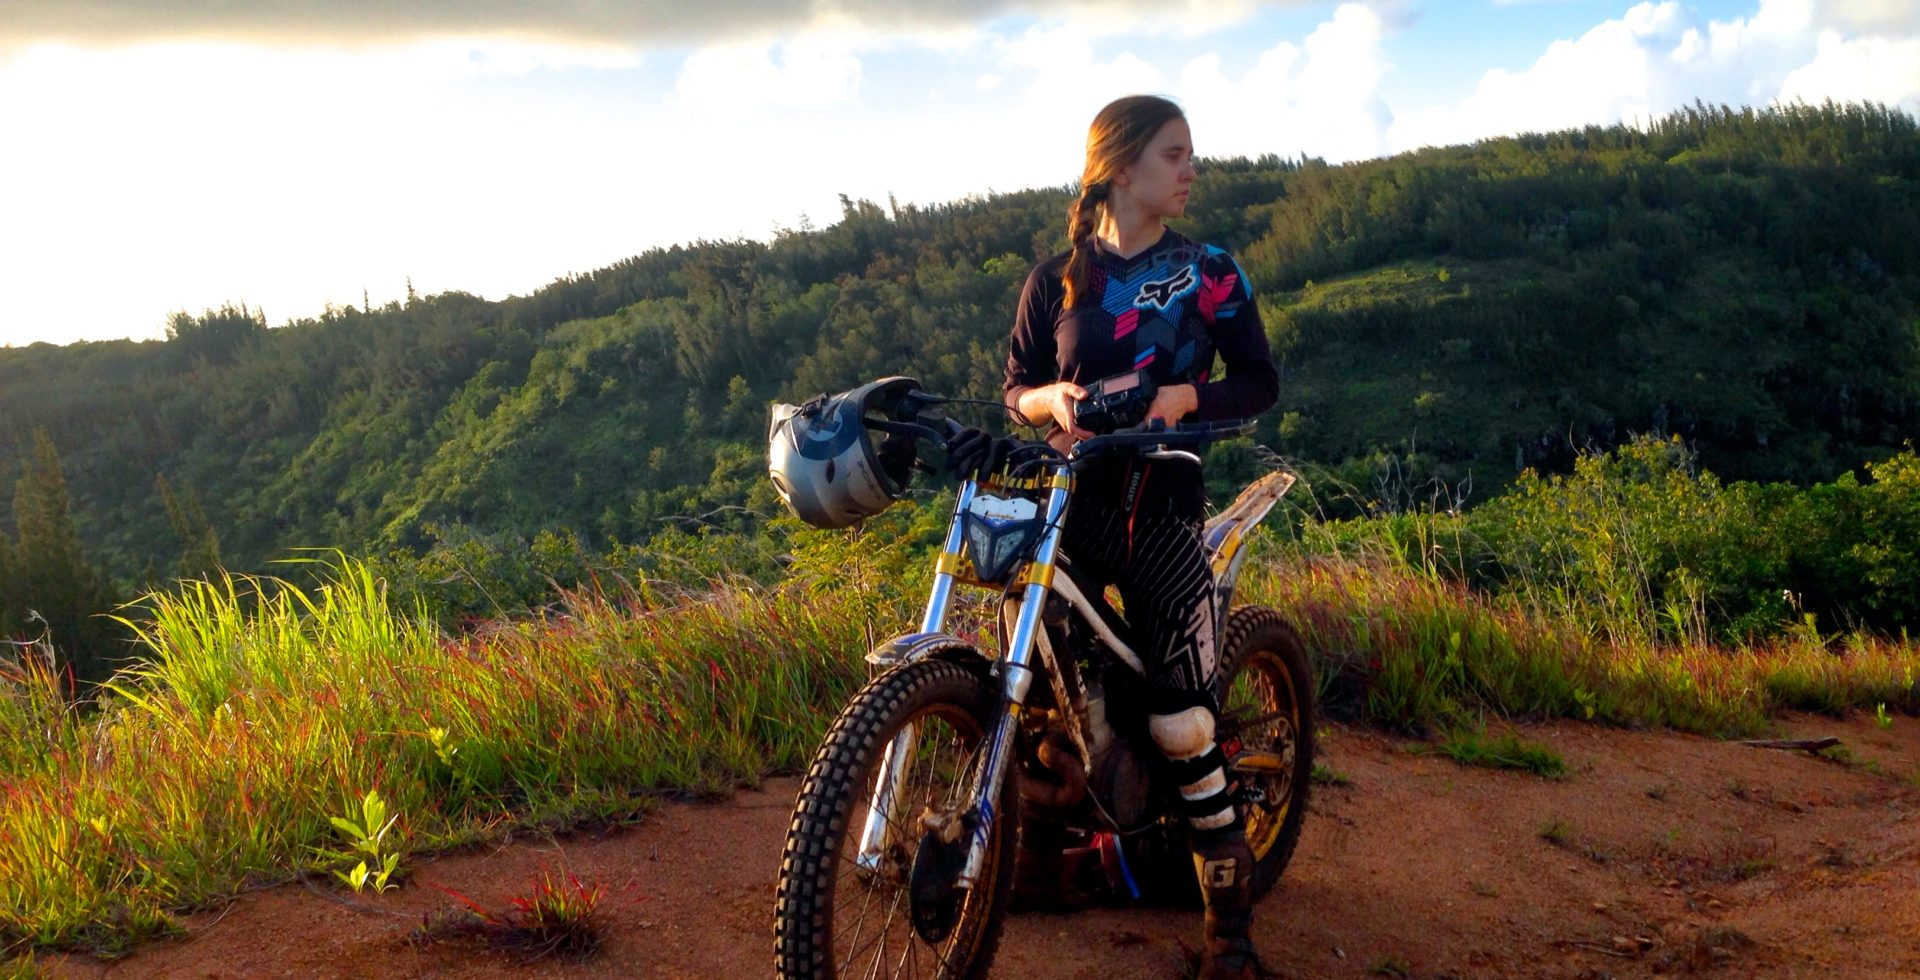 Dirt biking in Hawaii